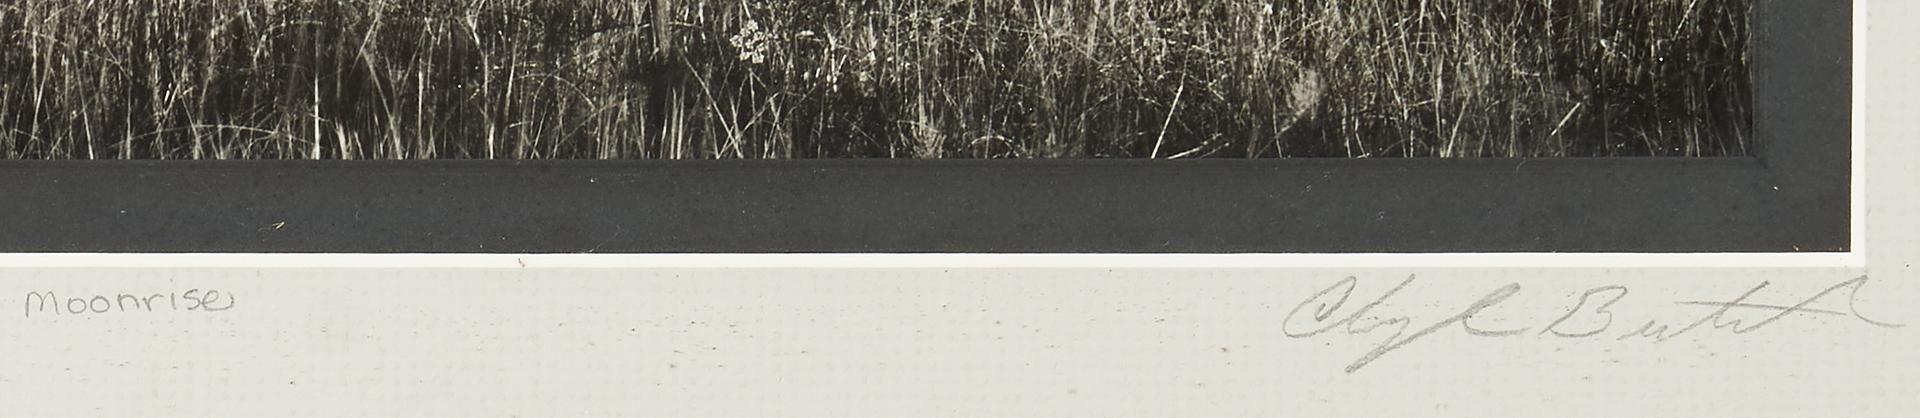 Lot 905: Clyde Butcher Photograph, Moonrise Everglades